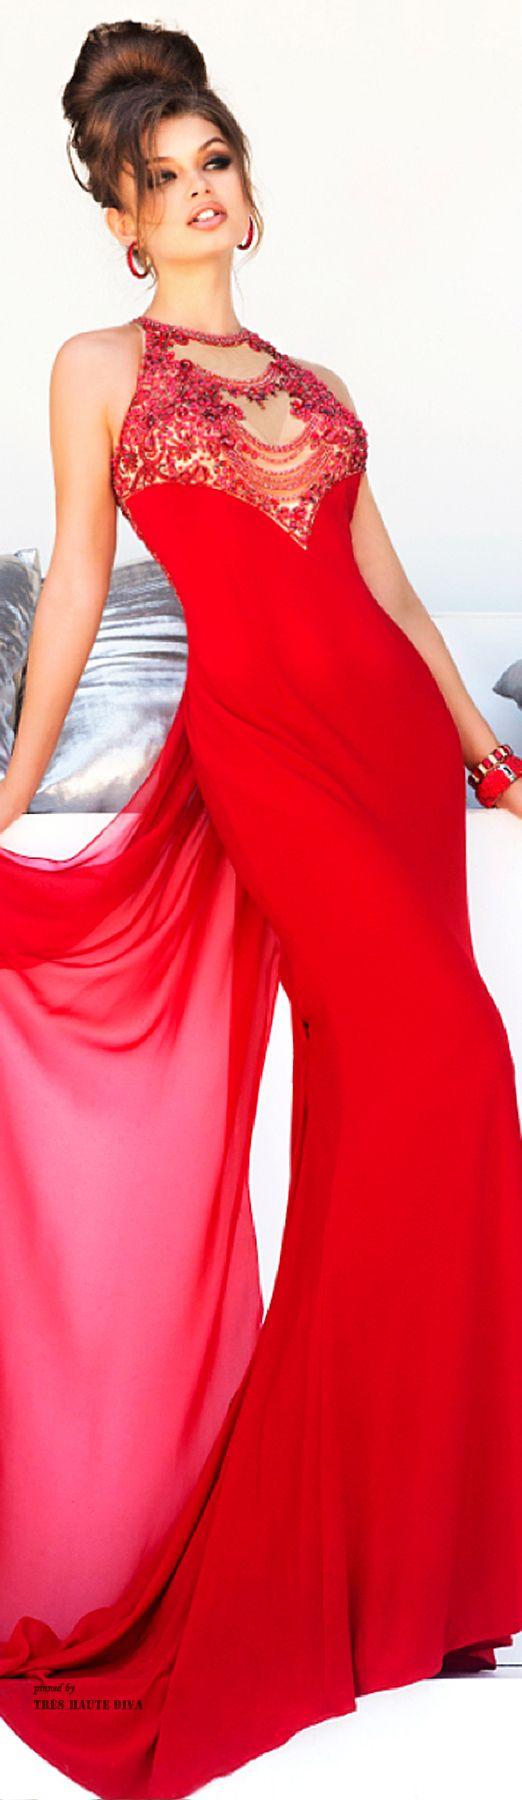 Sherri Hill Fall - red gown - 2014 #fashionserendipity